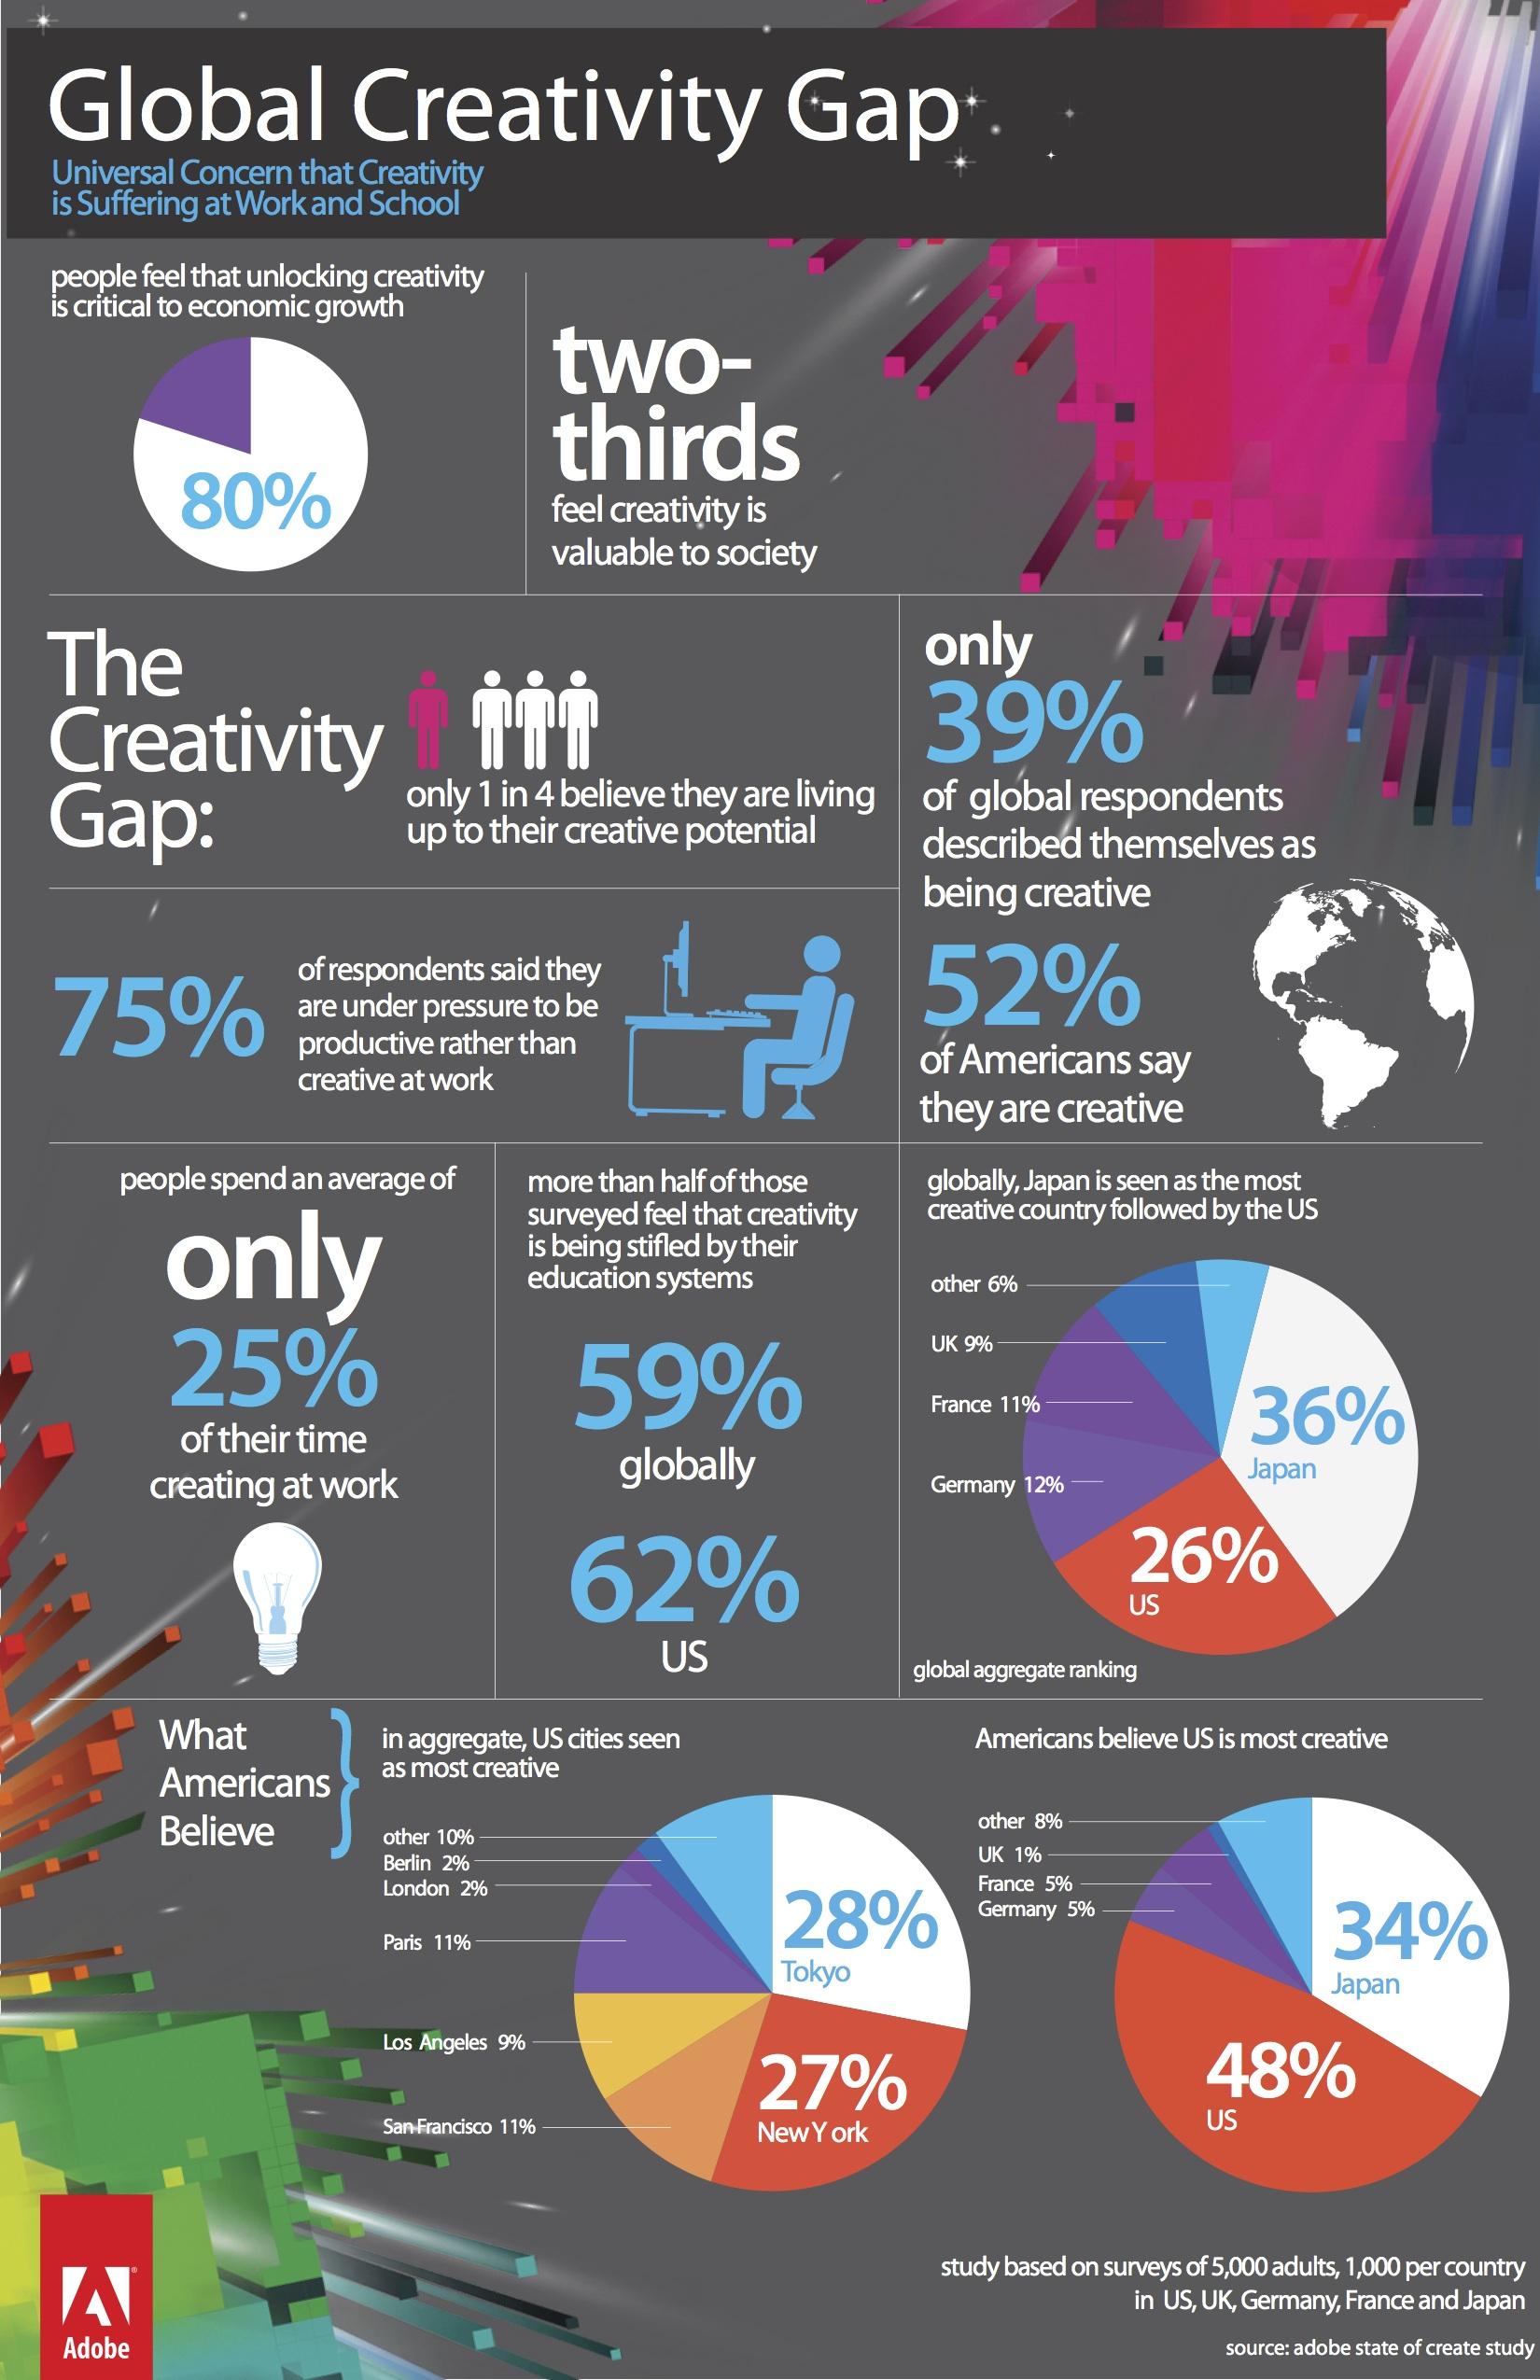 el mundo digital mata la creatividad